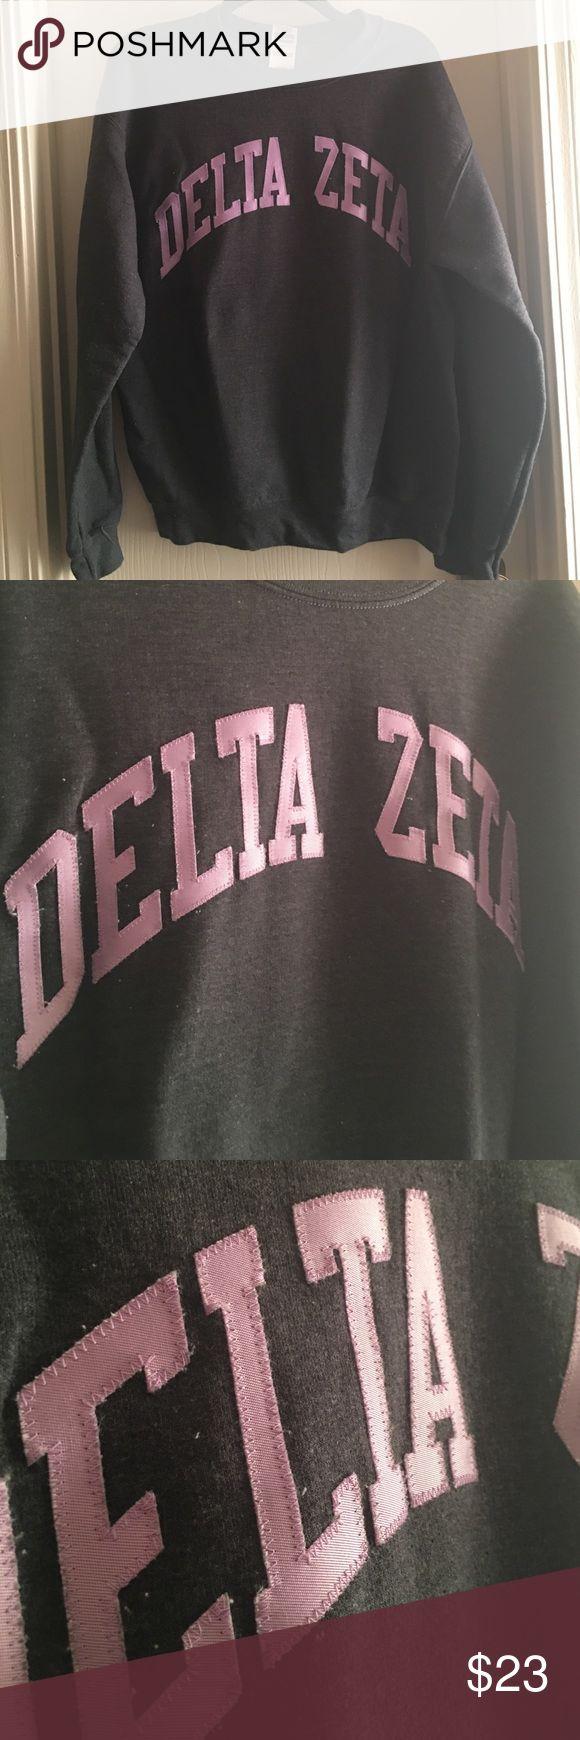 Delta zeta embroidered crewneck Gildan crewneck embroidered lettering, only worn a handful of times. Great condition! Gildan Tops Sweatshirts & Hoodies